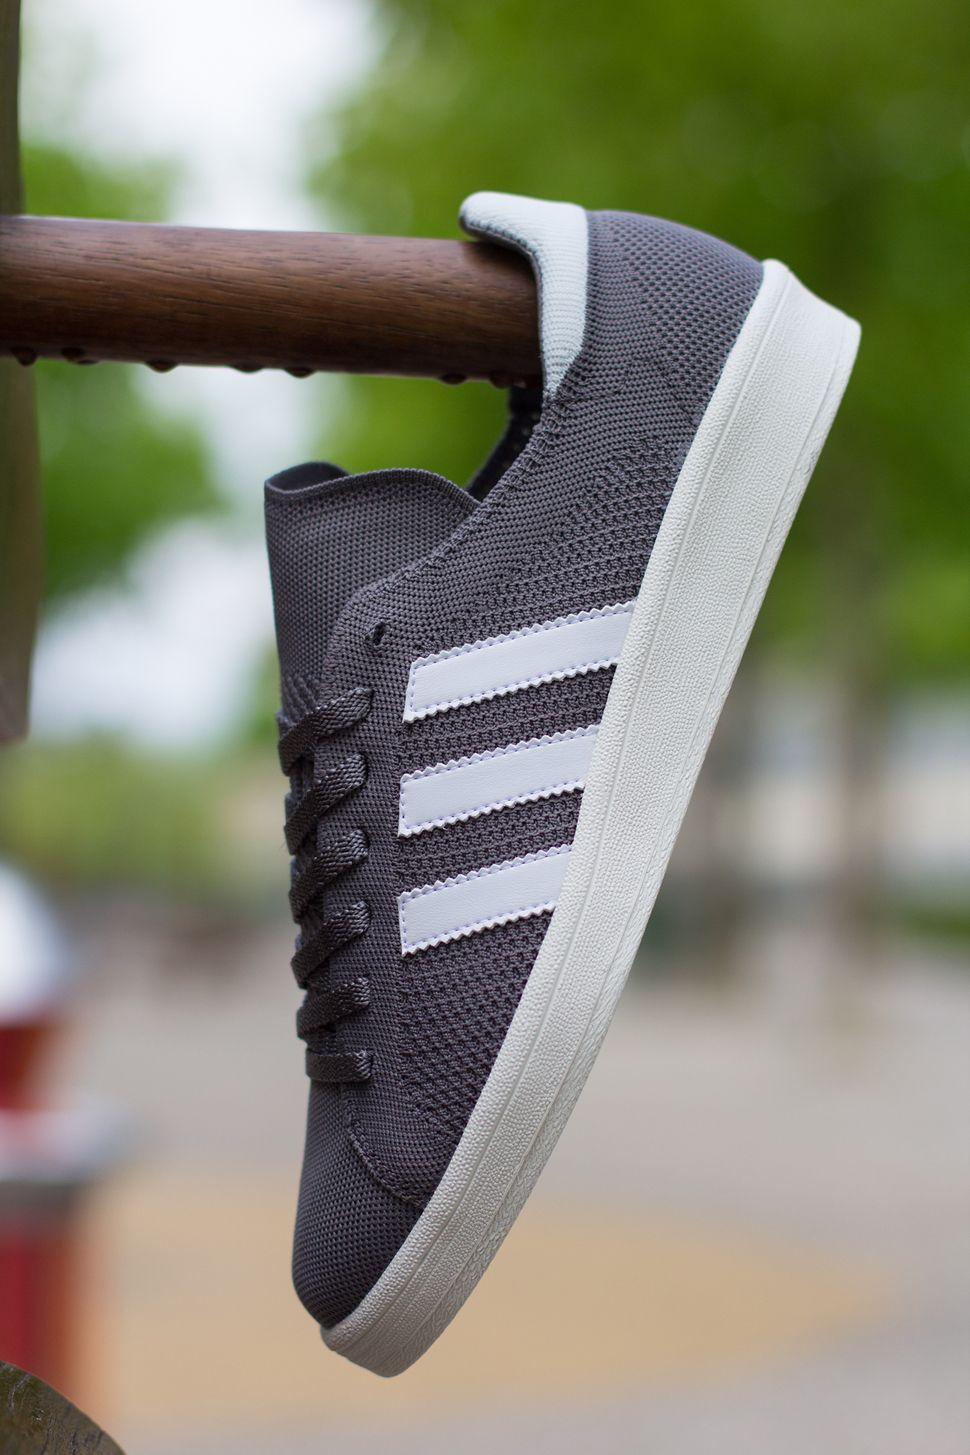 Adidas campus shoes, Adidas shoes mens